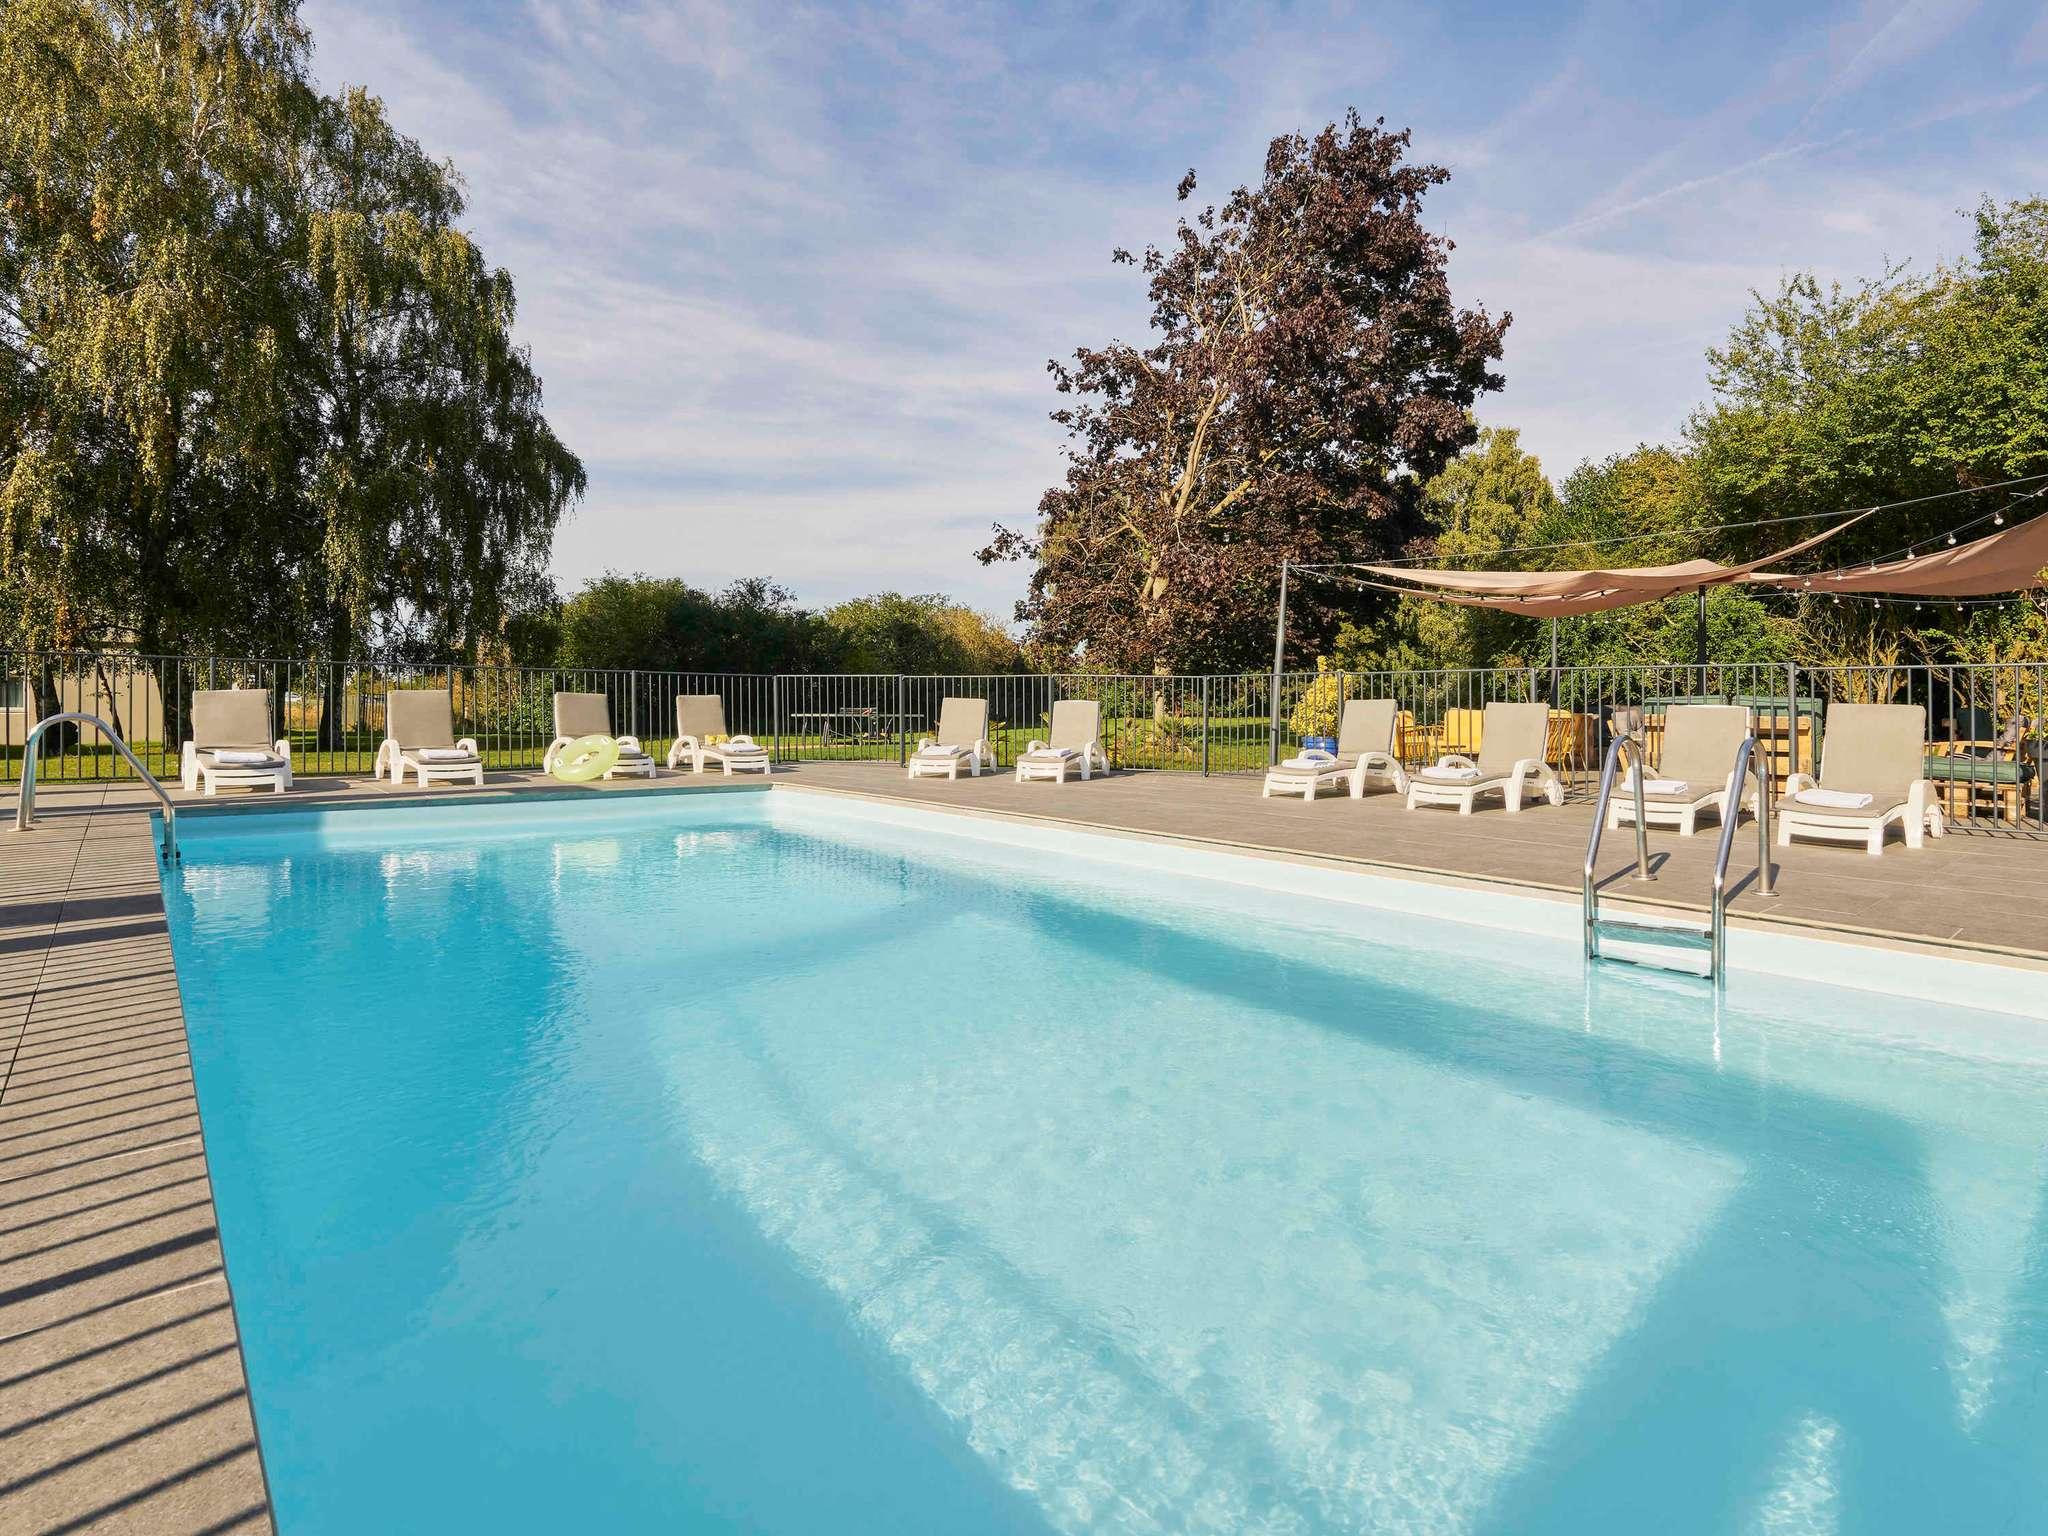 Hotel – Novotel Survilliers Saint Witz